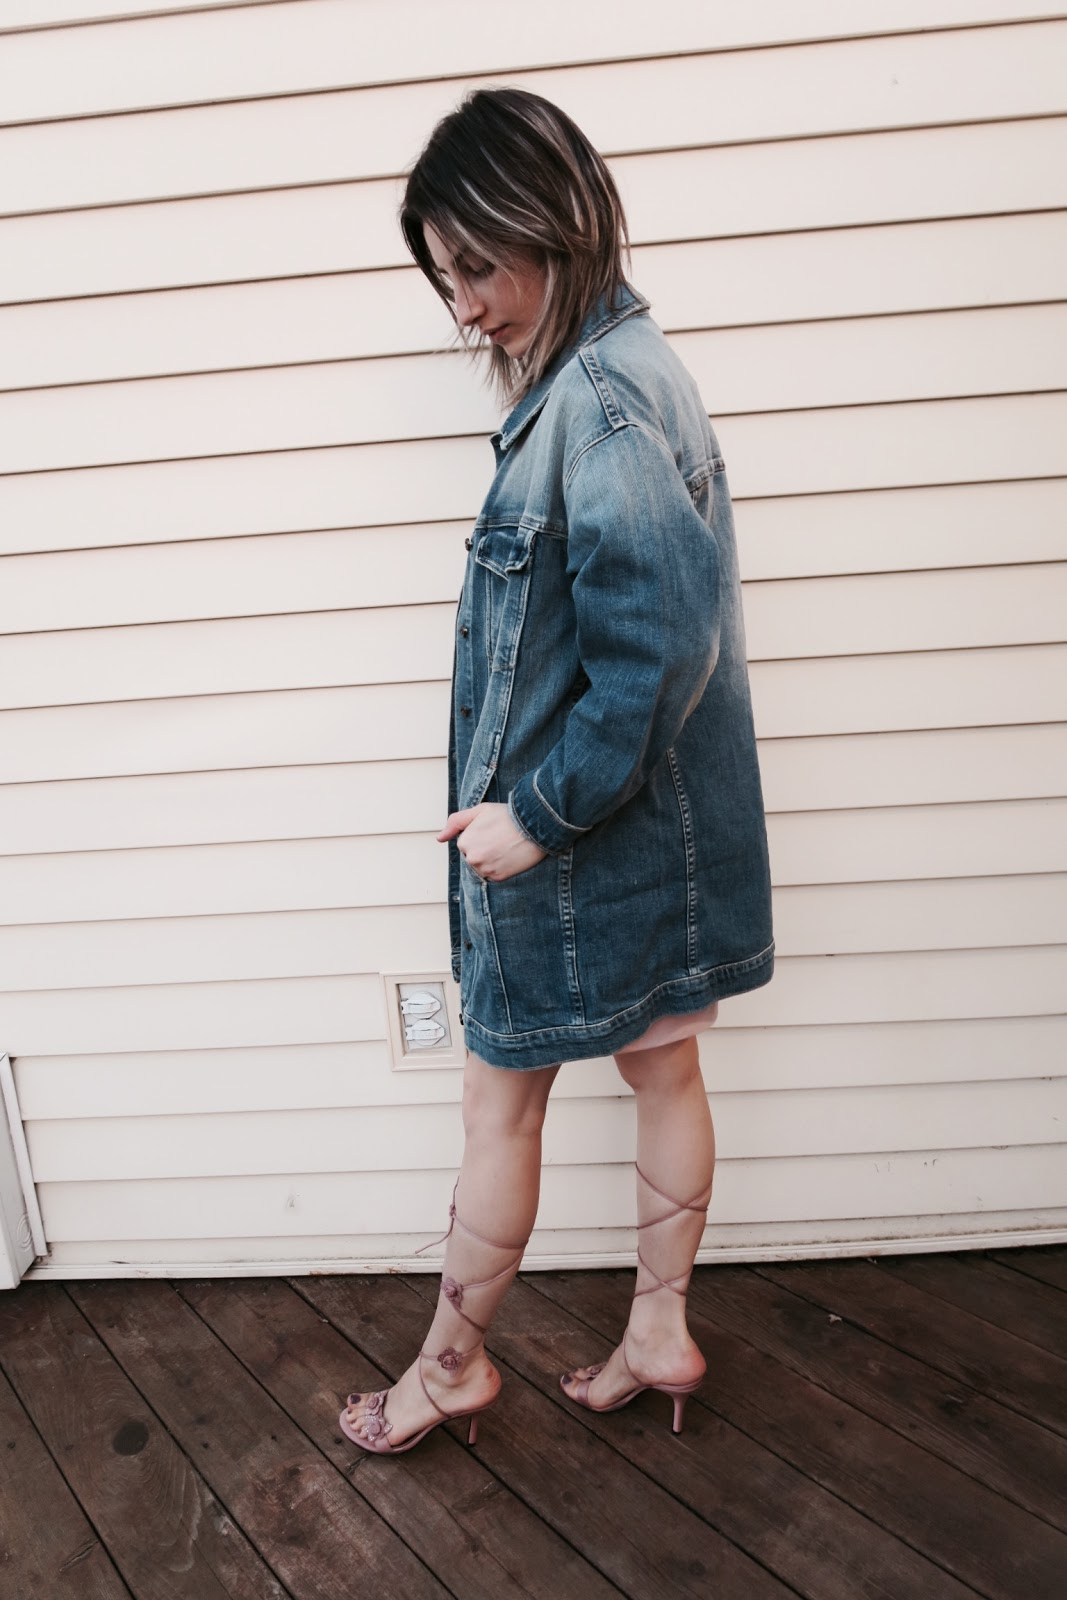 Mauve, Sweater Dress, Formal Wear, Denim Jacket, Sandal Heels